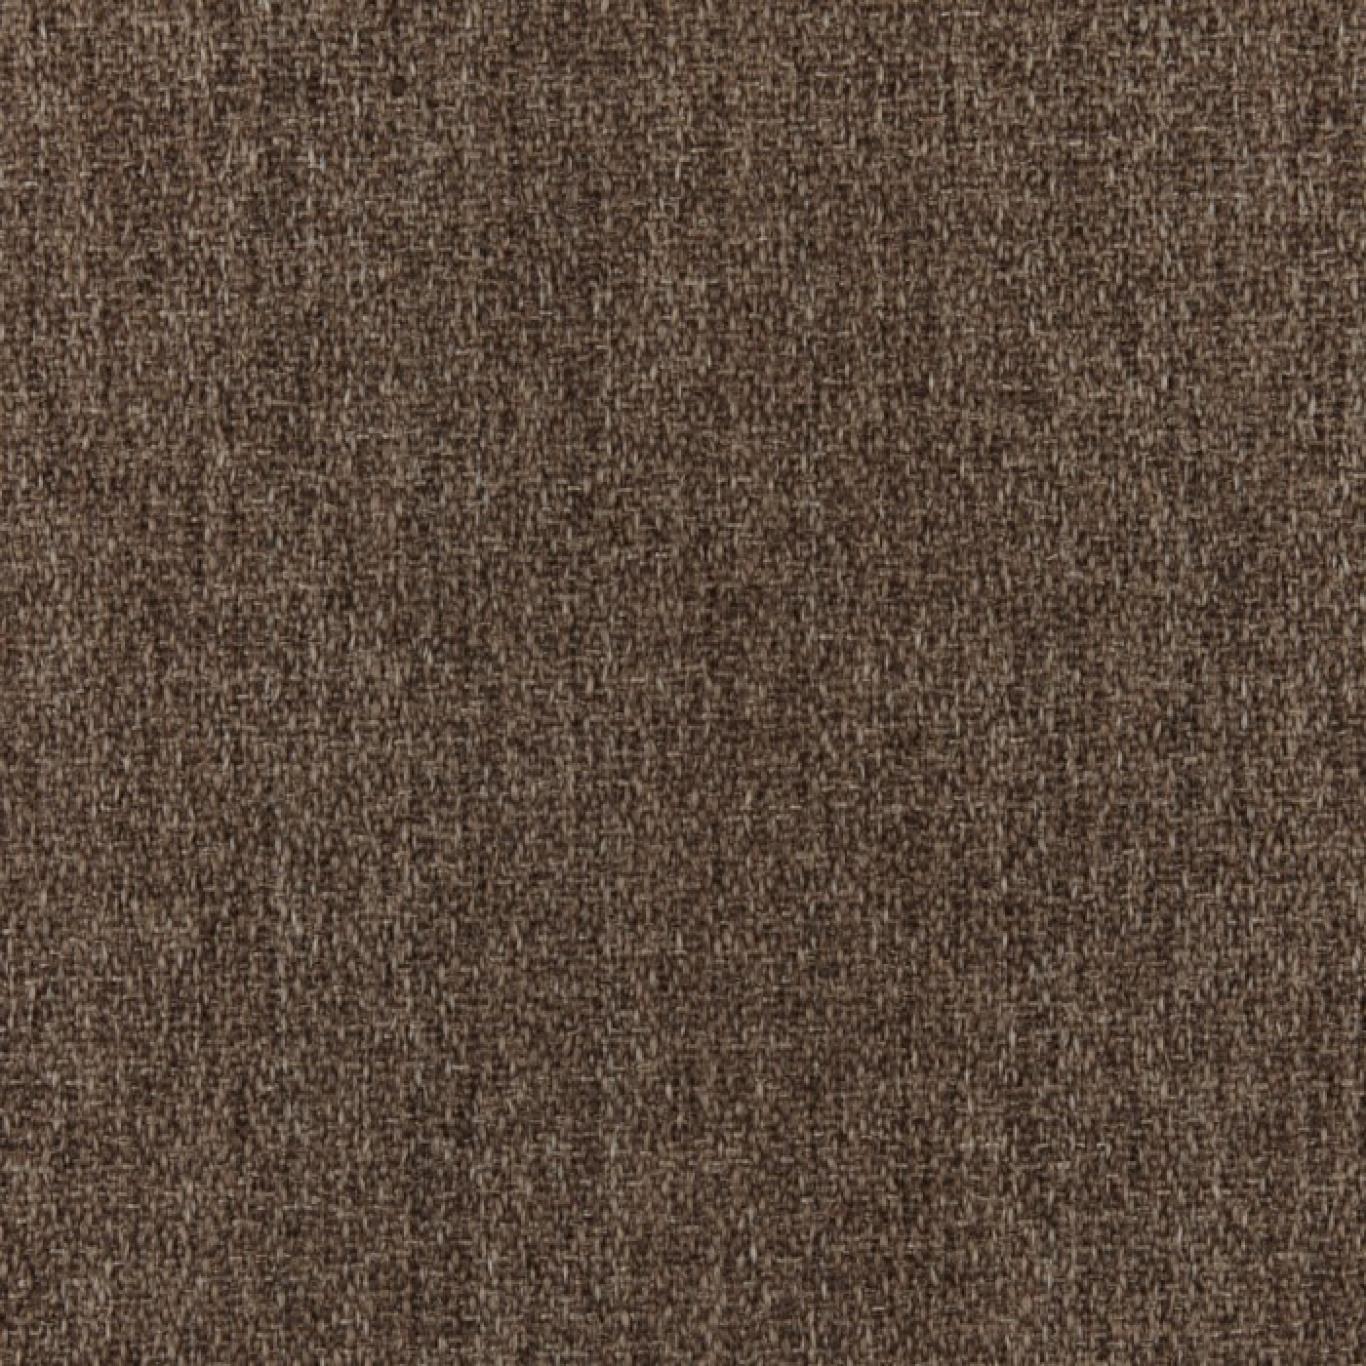 Image of Prestigious Harrison Bracken Fabric